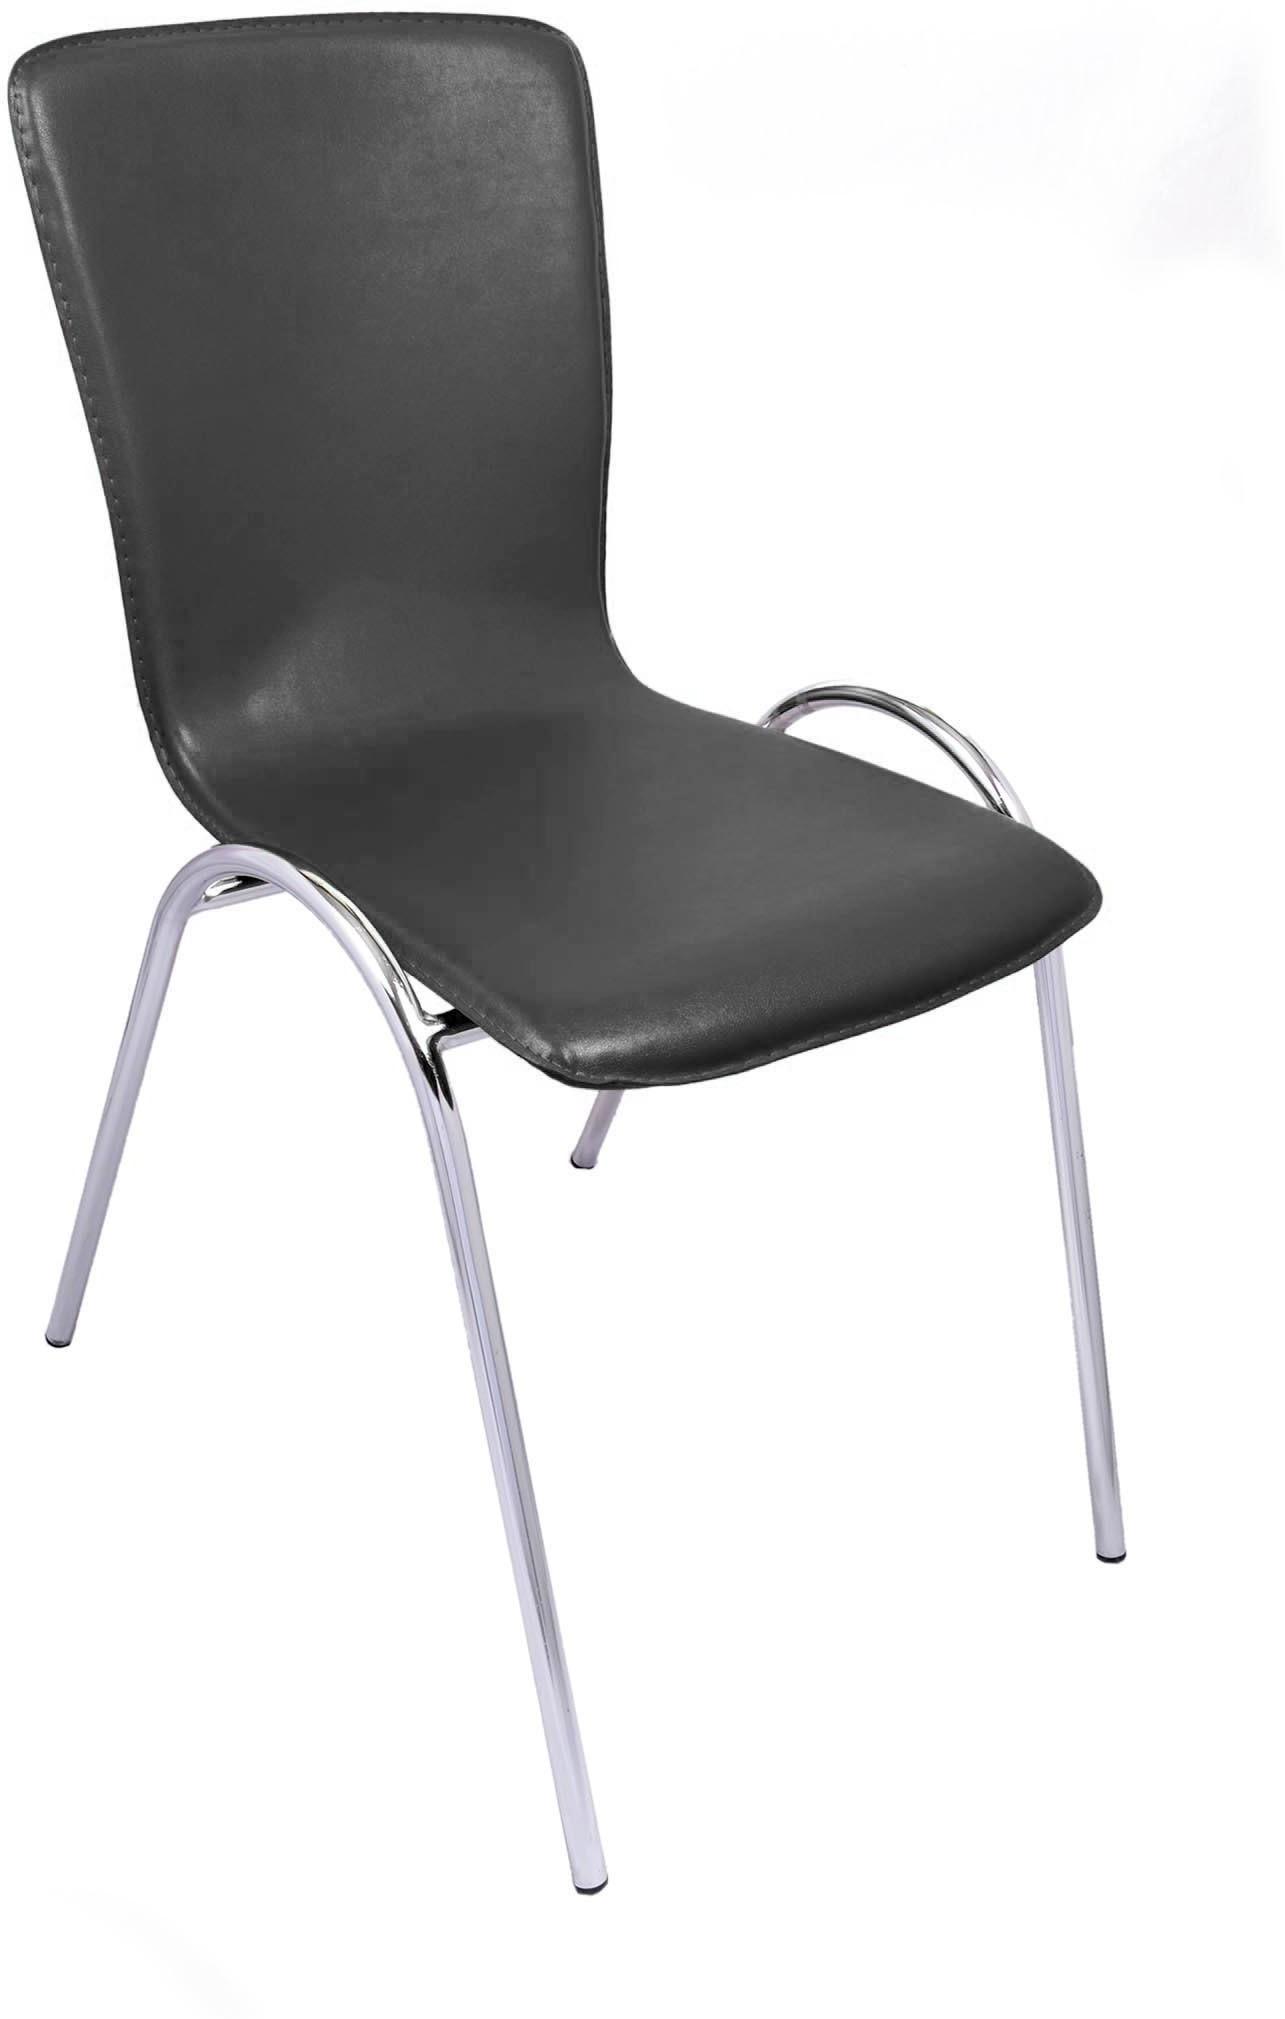 View Darla Interiors Leatherette Office Chair(Black) Furniture (Darla Interiors)